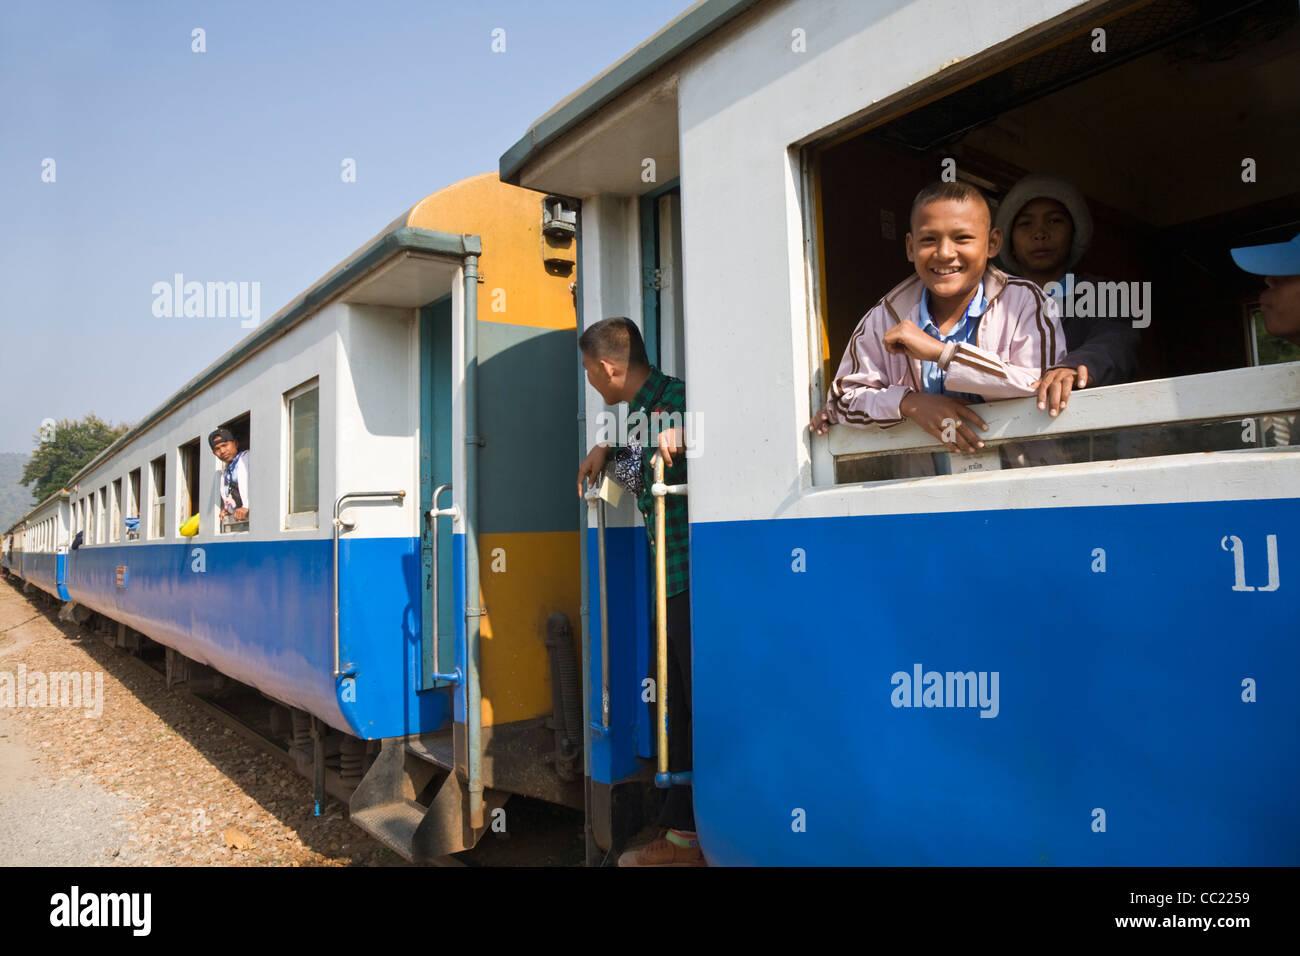 Train ride on the Thailand-Burma railway (also known as Death Railway).  Kanchanaburi, Kanchanaburi, Thailand - Stock Image